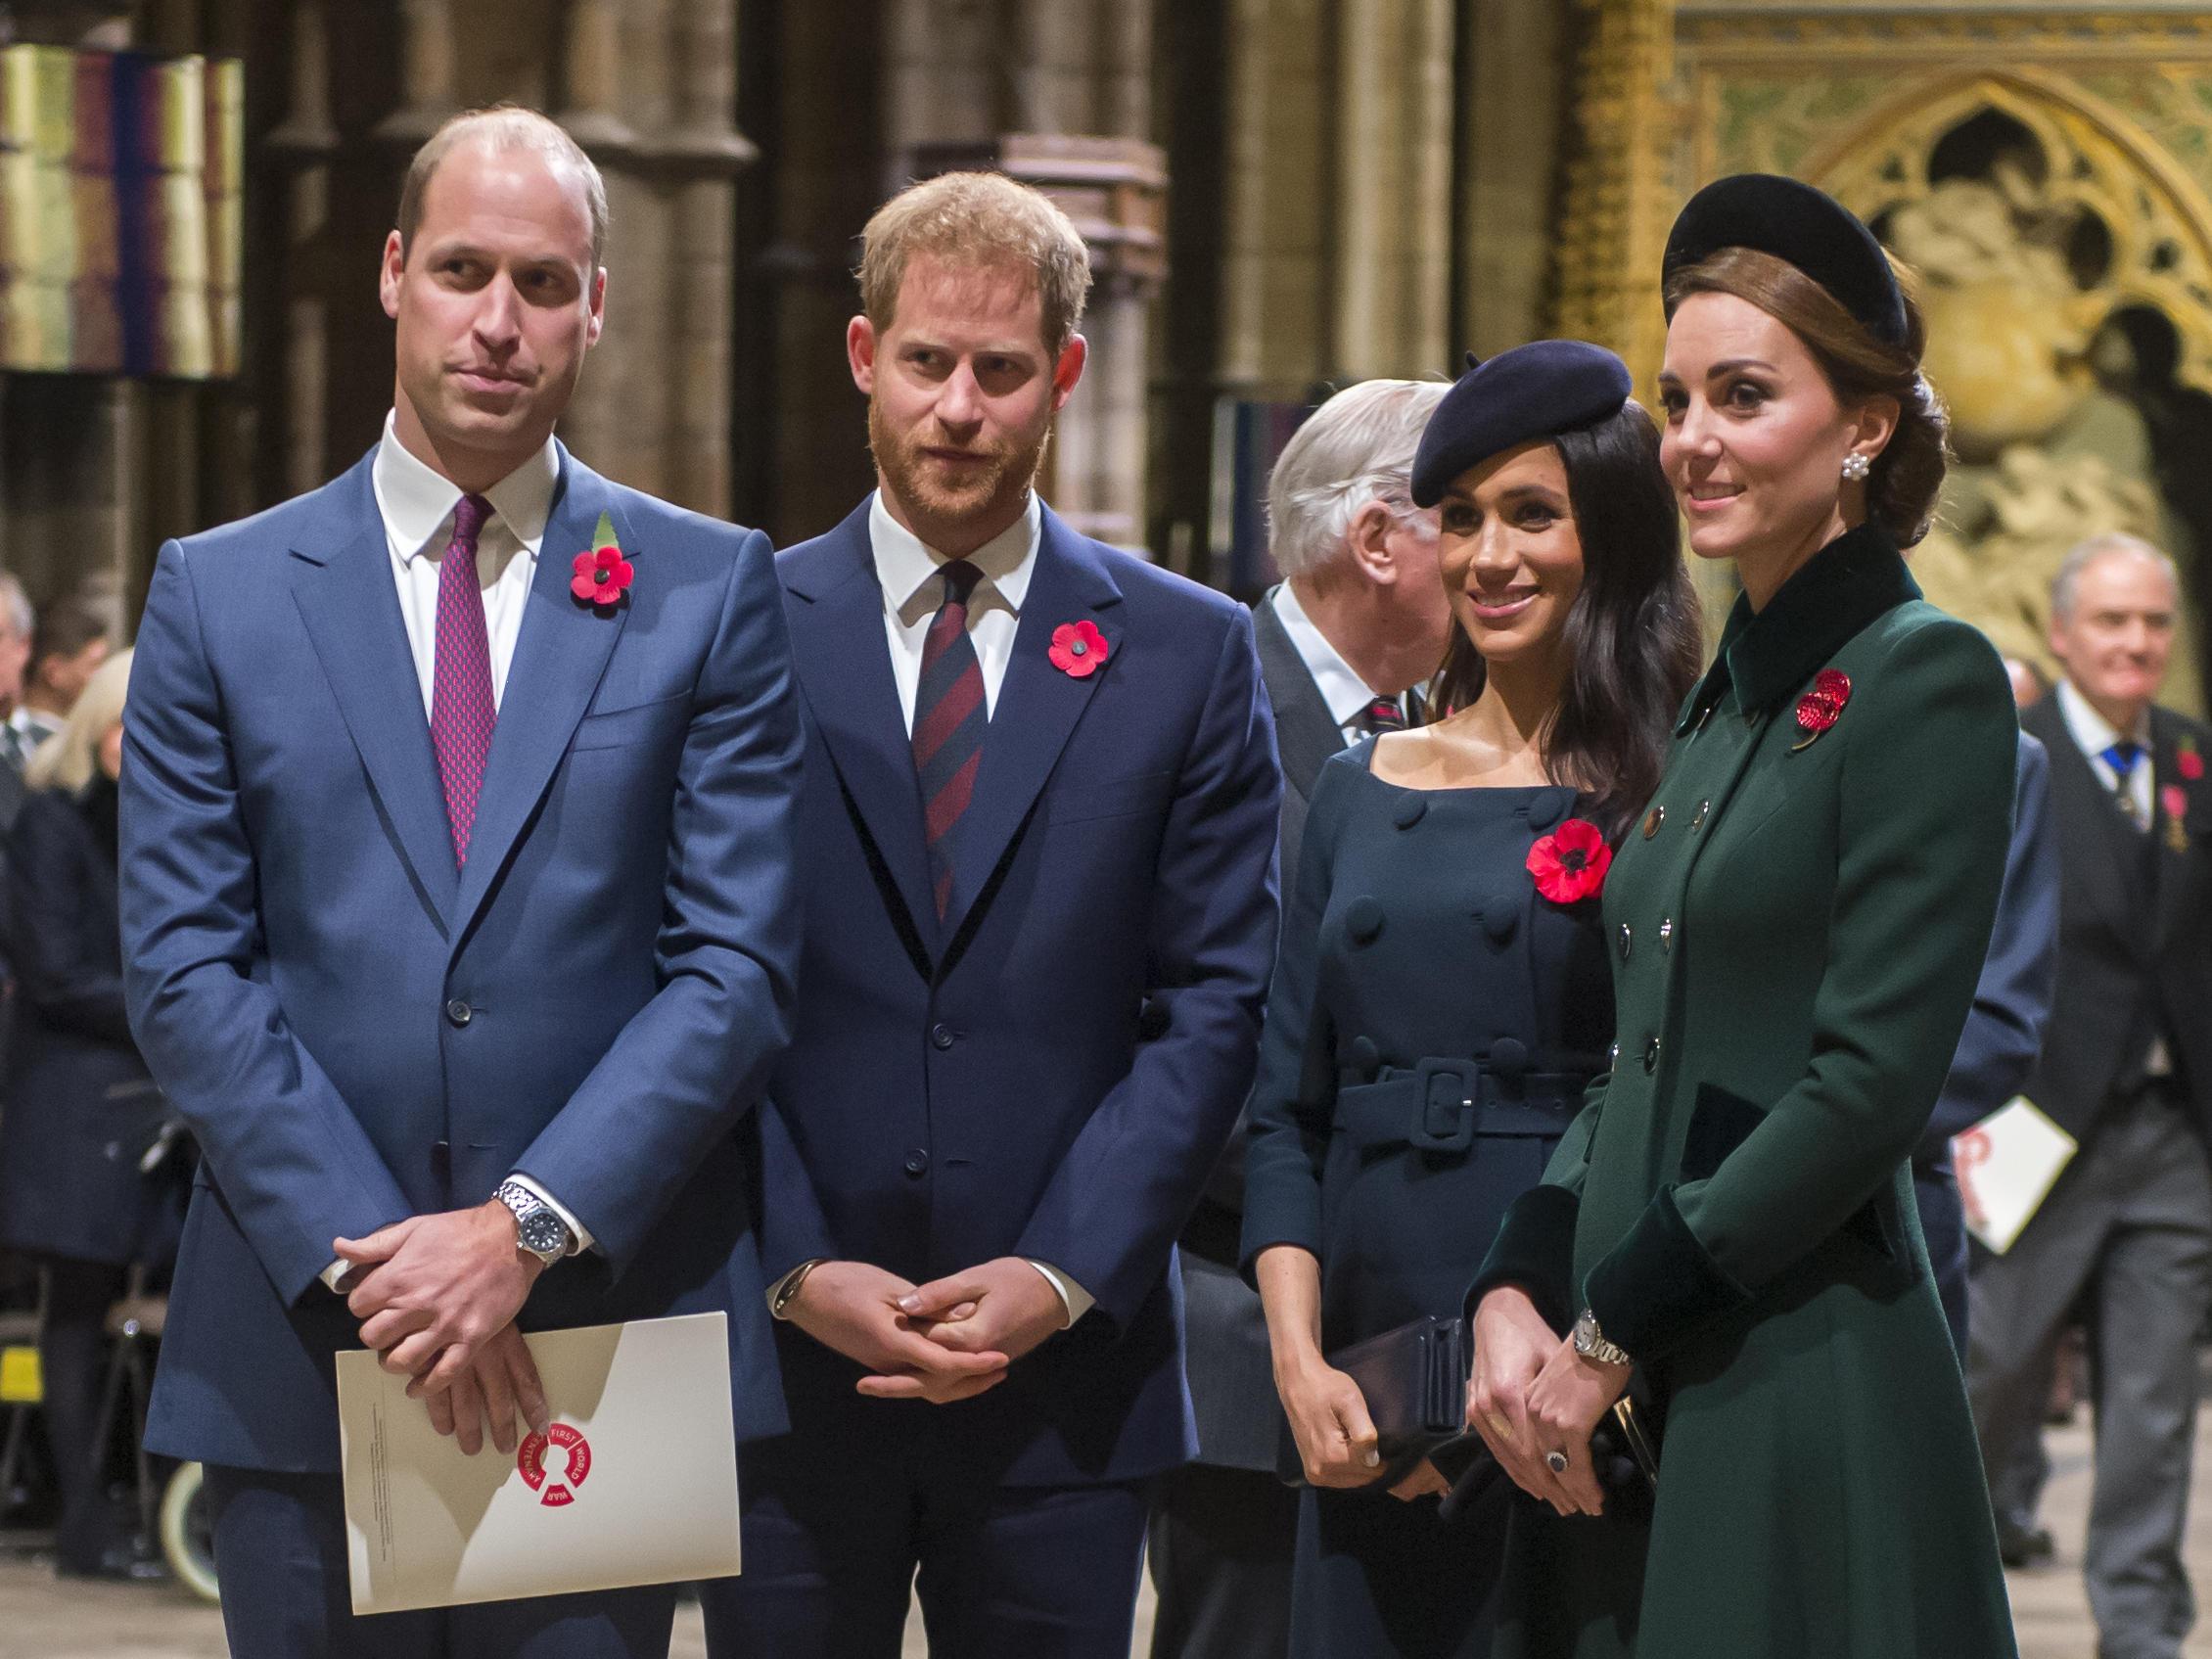 Harry, Meghan drop 'royal highness' titles